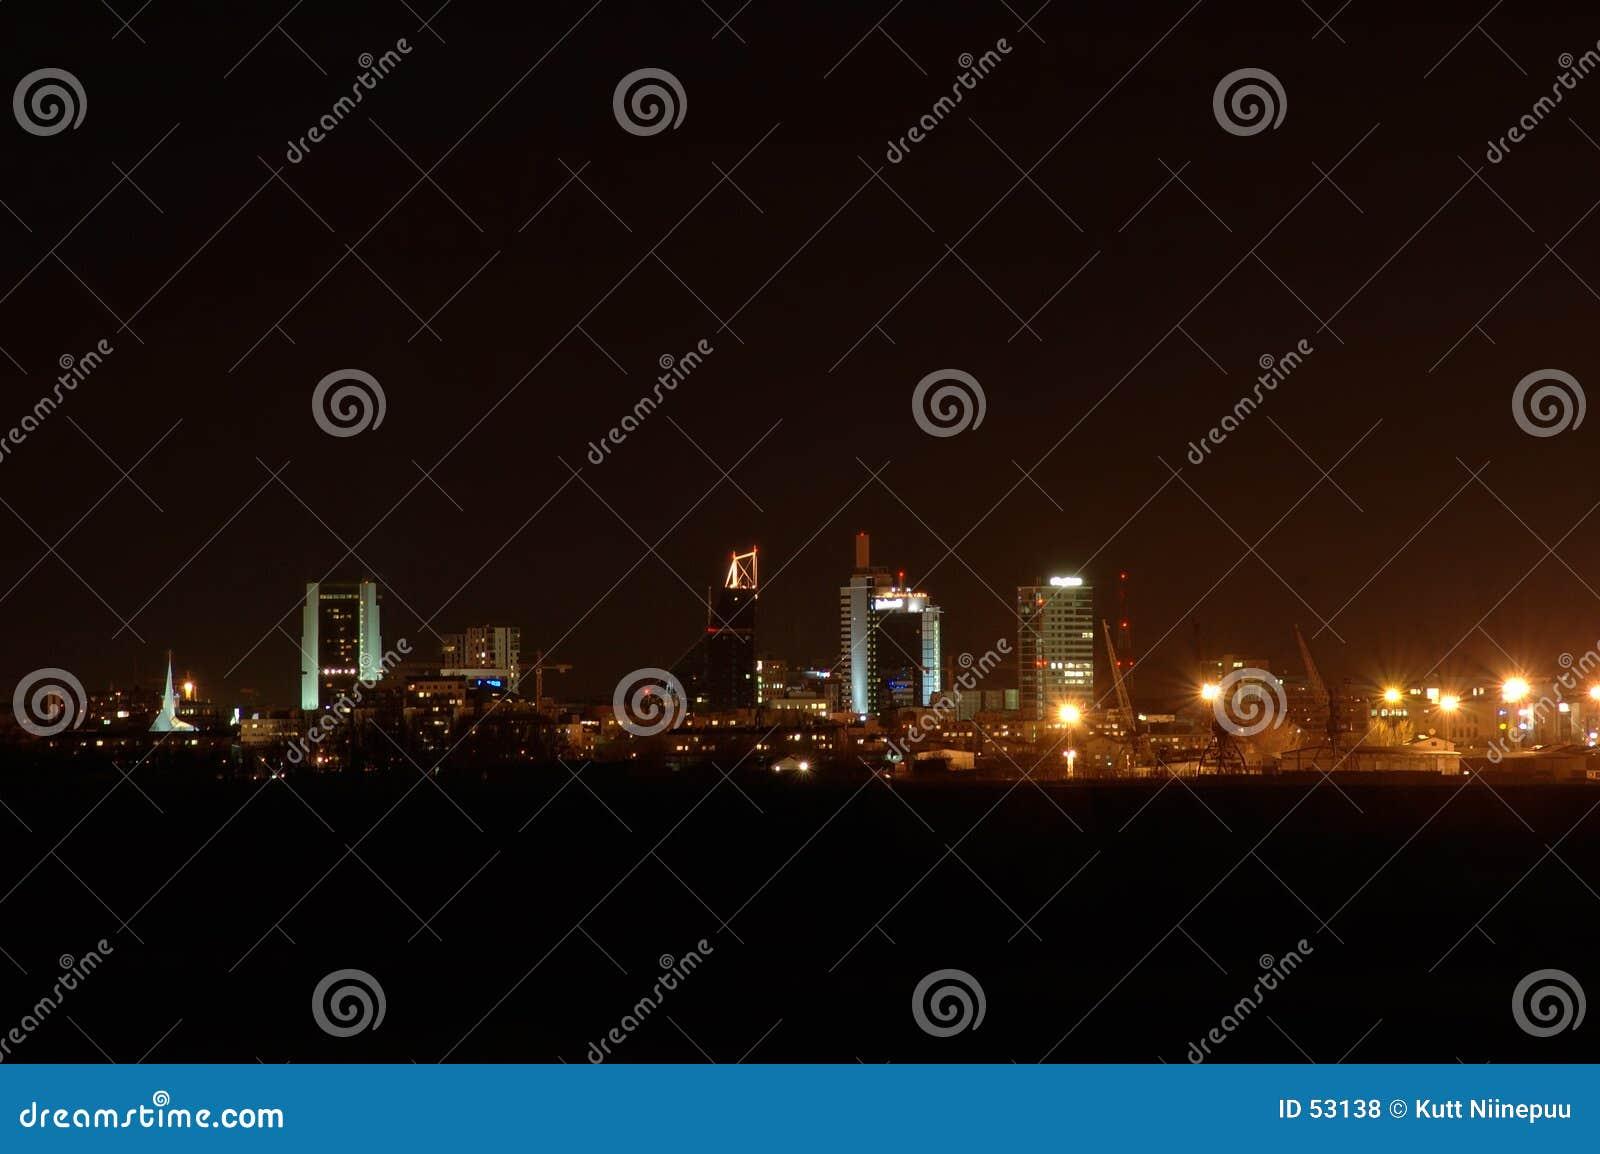 Download 1 night view στοκ εικόνες. εικόνα από προβολείς, φω, πόλη - 53138